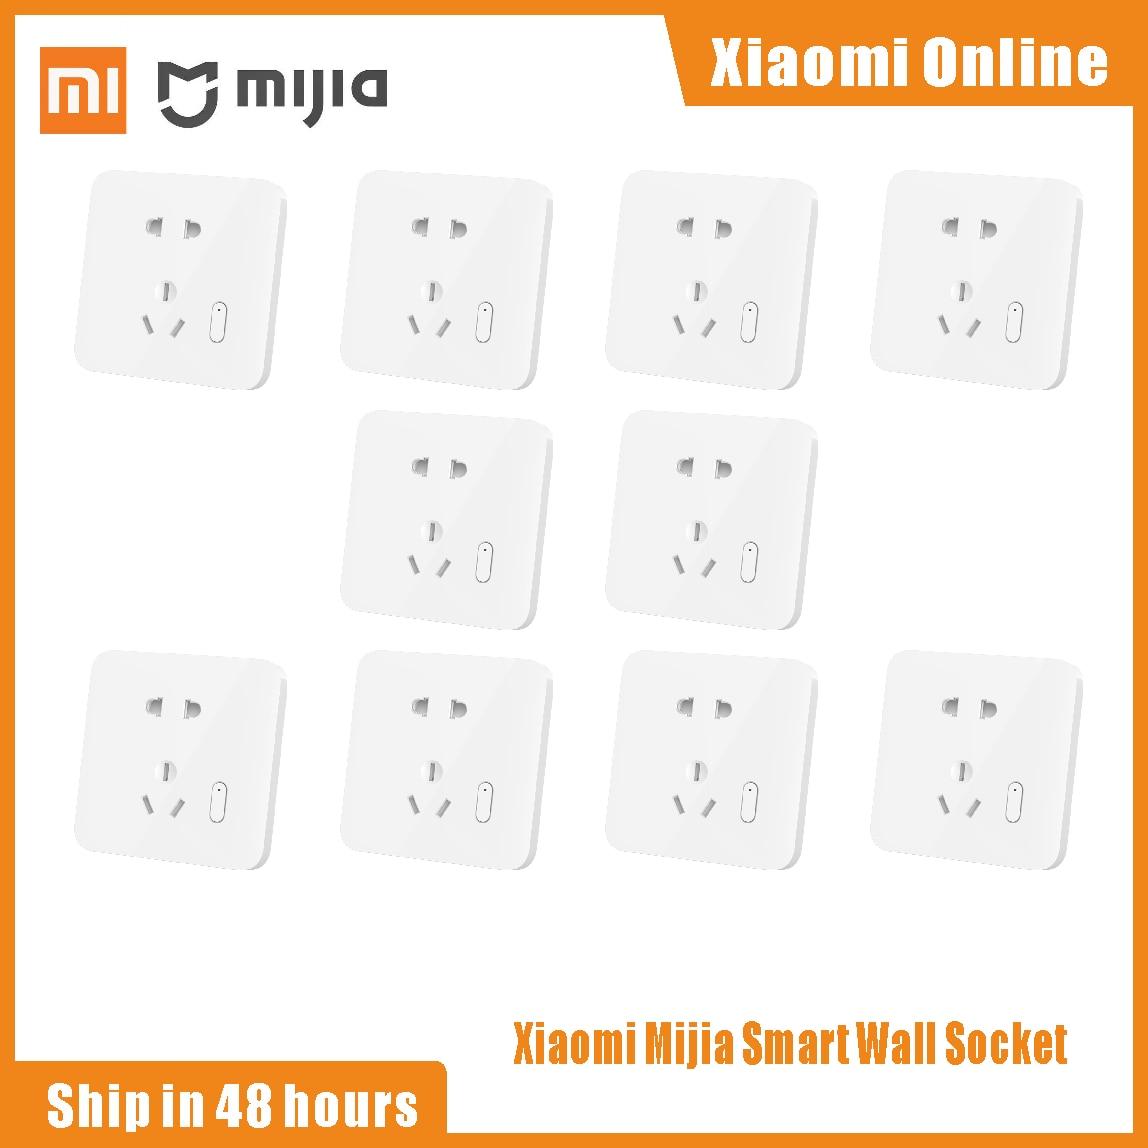 Xiaomi Mijia-مقبس حائط ذكي ، مقبس حائط 250 فولت ، تحكم صوتي ، ترقية OTA ، MijiaAPP